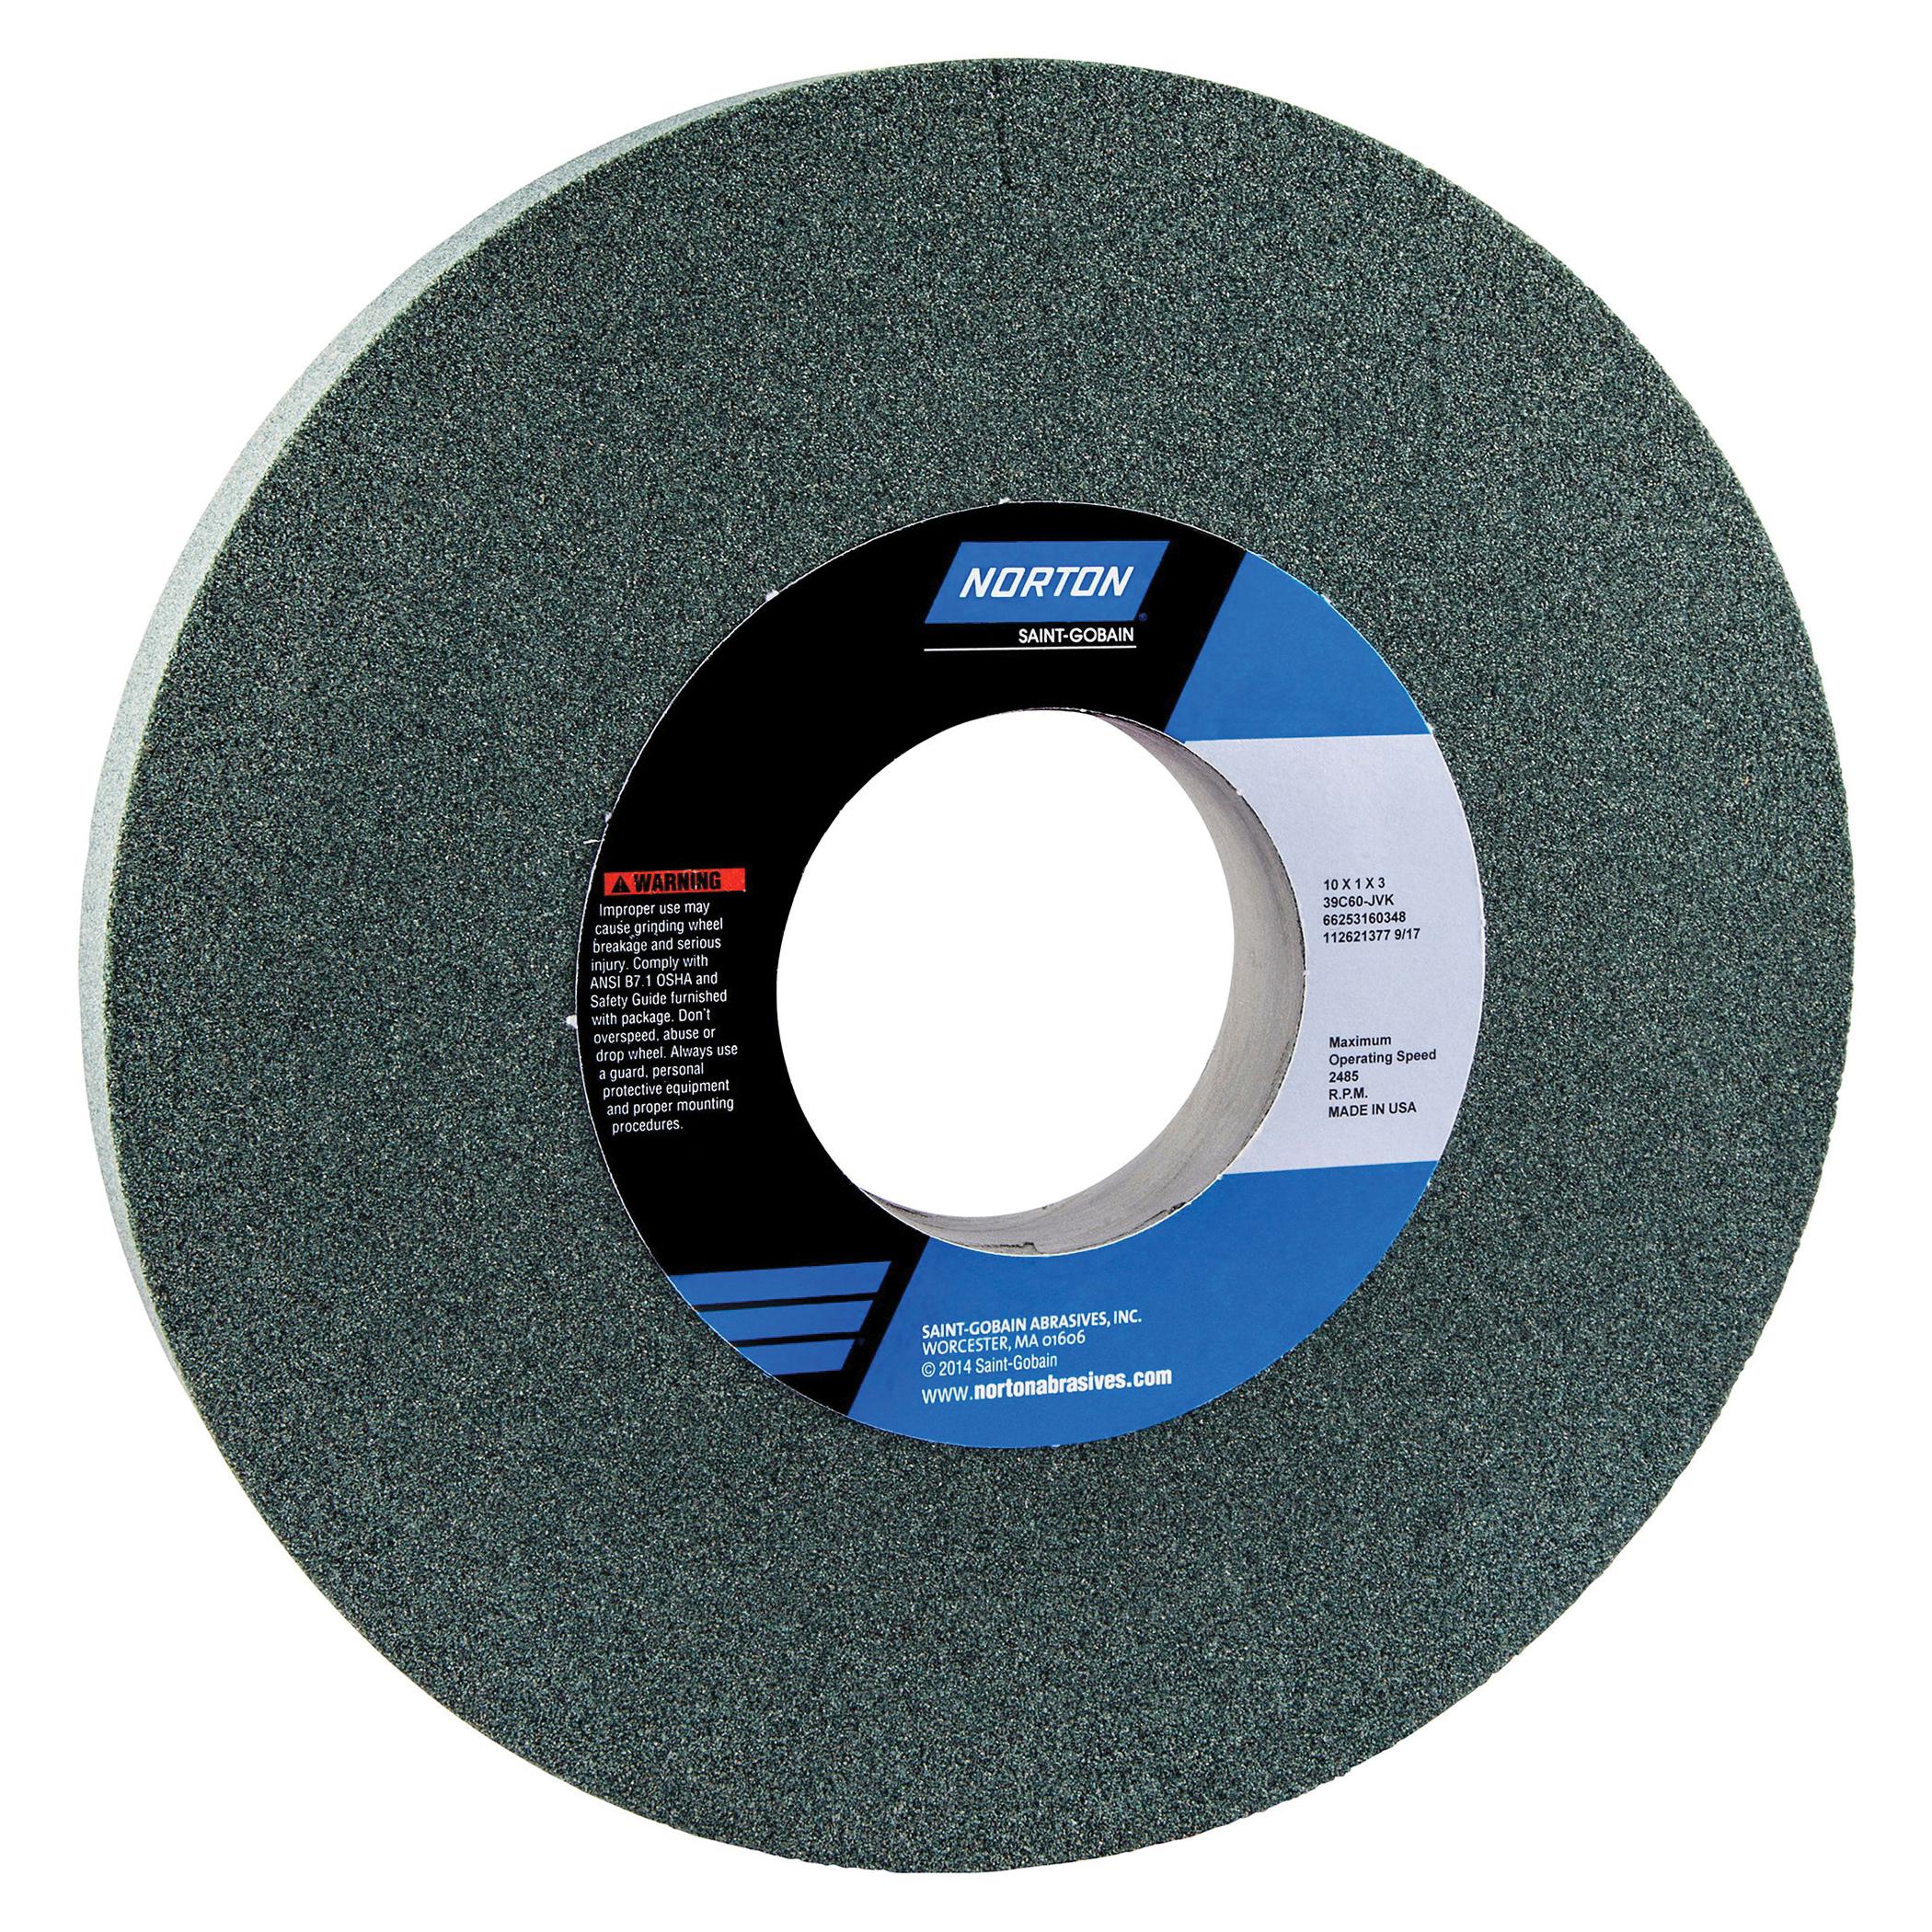 Norton® 66253160348 39C Straight Toolroom Wheel, 10 in Dia x 1 in THK, 3 in Center Hole, 60 Grit, Silicon Carbide Abrasive